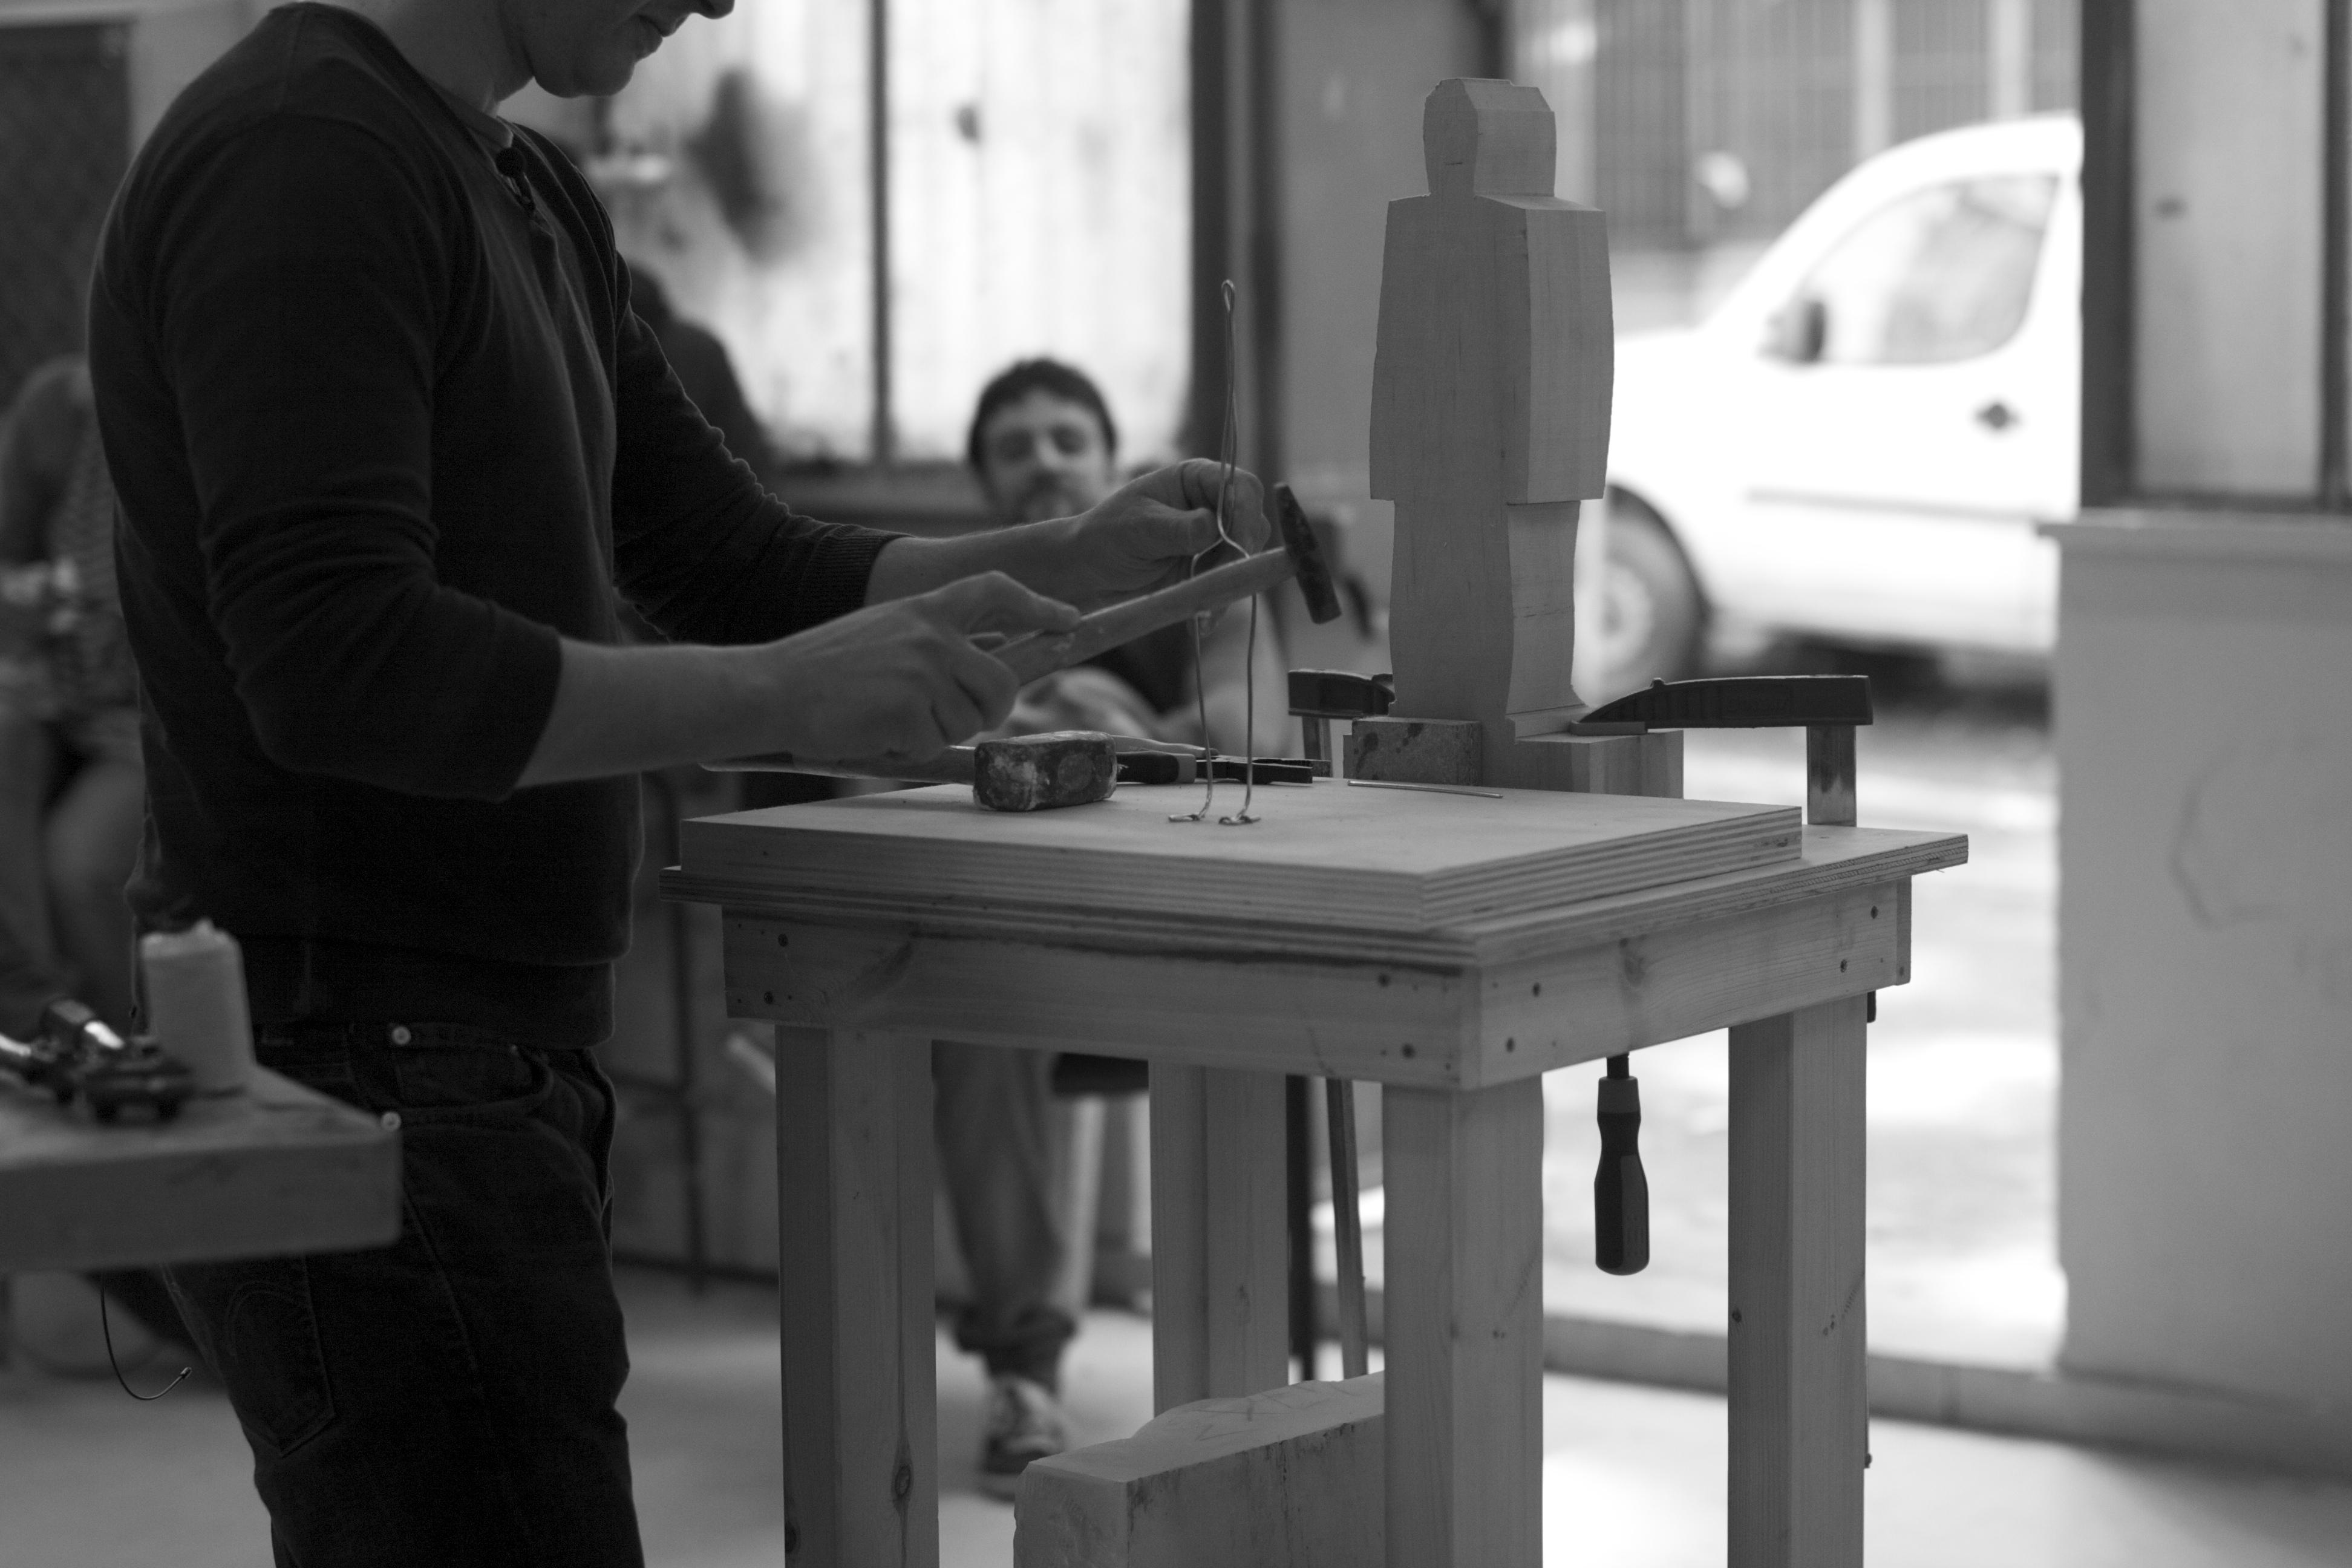 Flickr - Aron Demetz - Dialoghi e materia - Workshop a cura di Franco Reina24